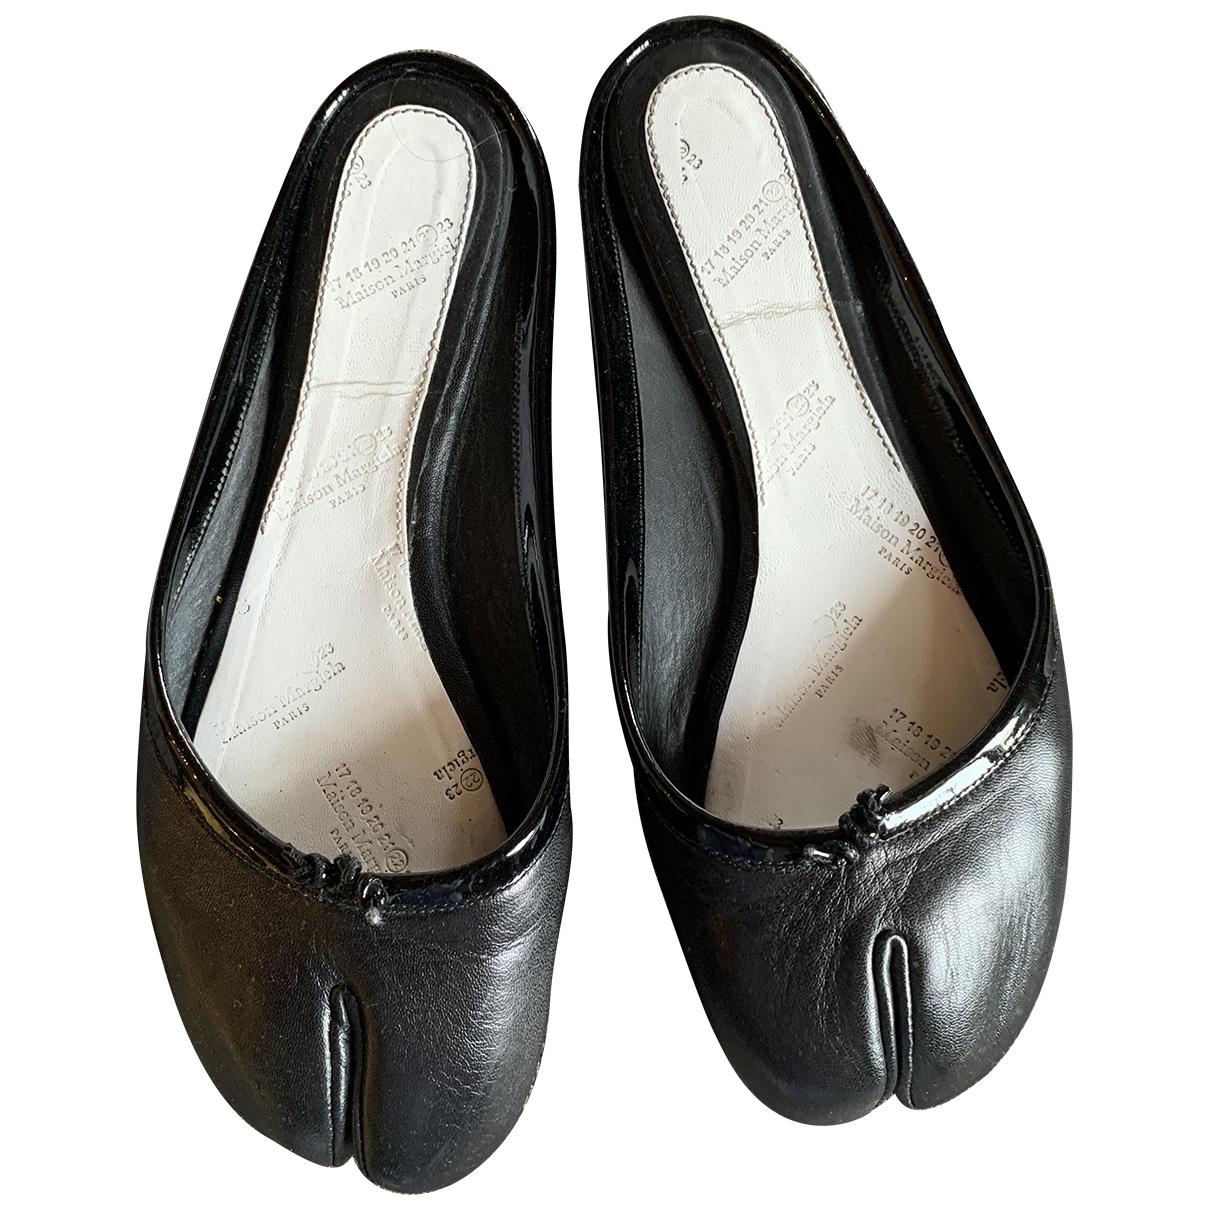 Maison Martin Margiela \N Ballerinas in  Schwarz Leder